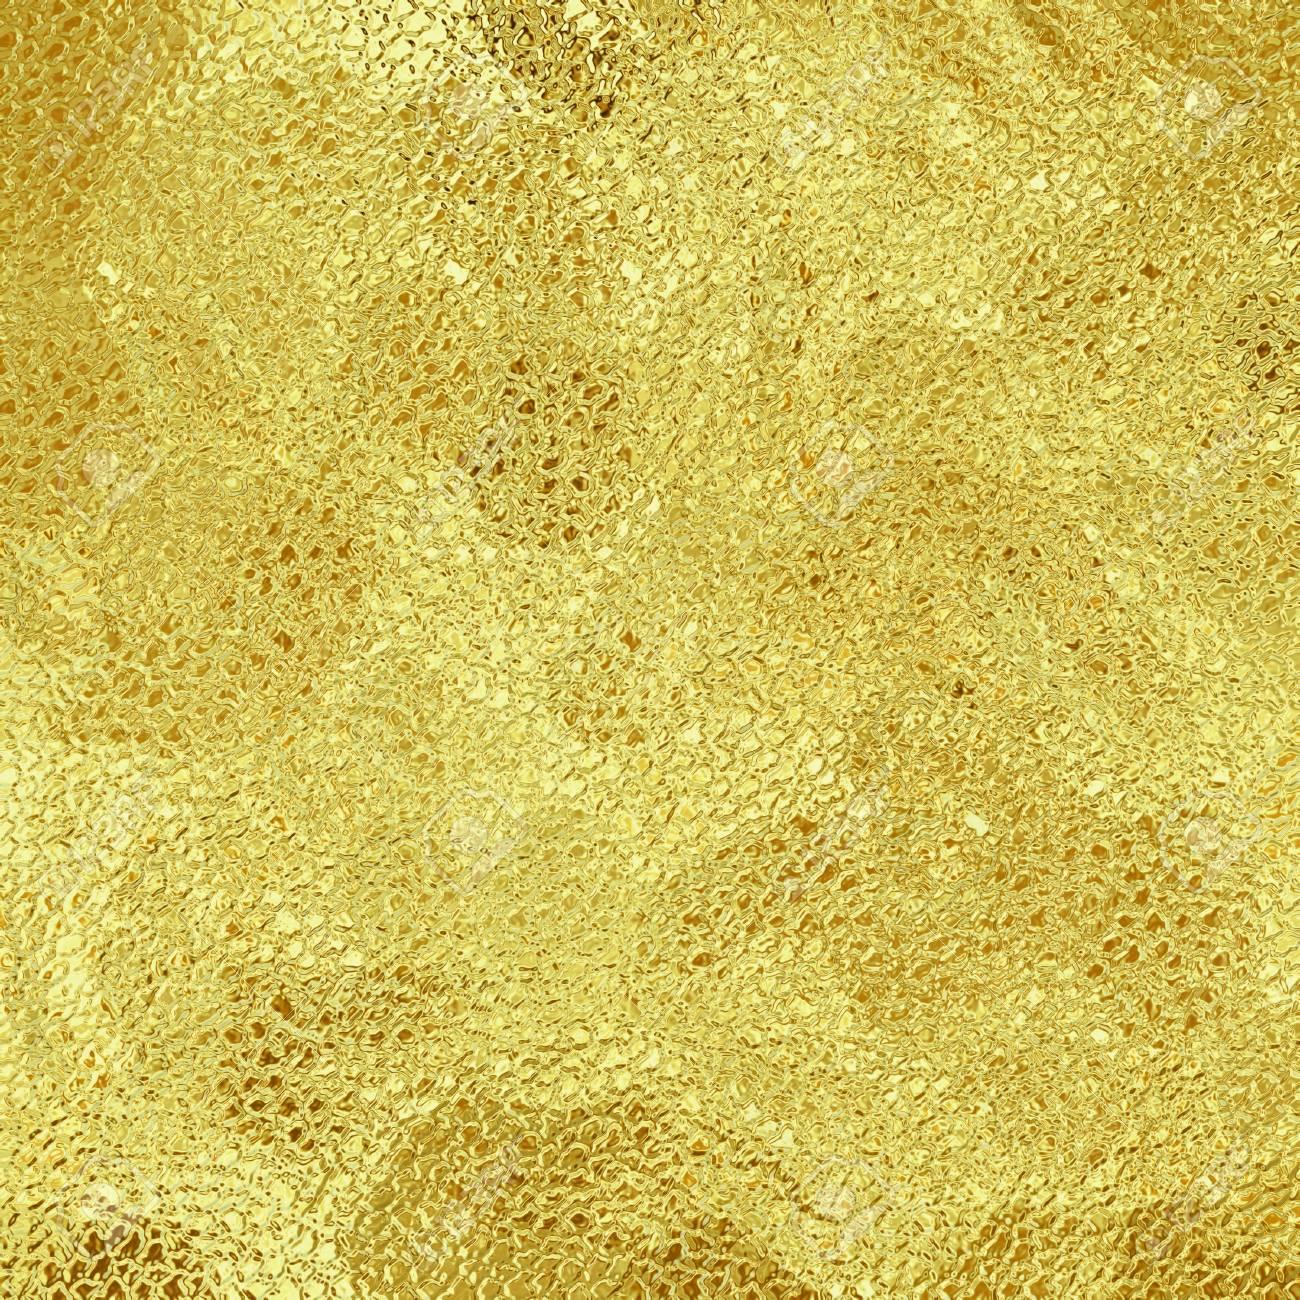 gold foil Stock Photo - 9962994